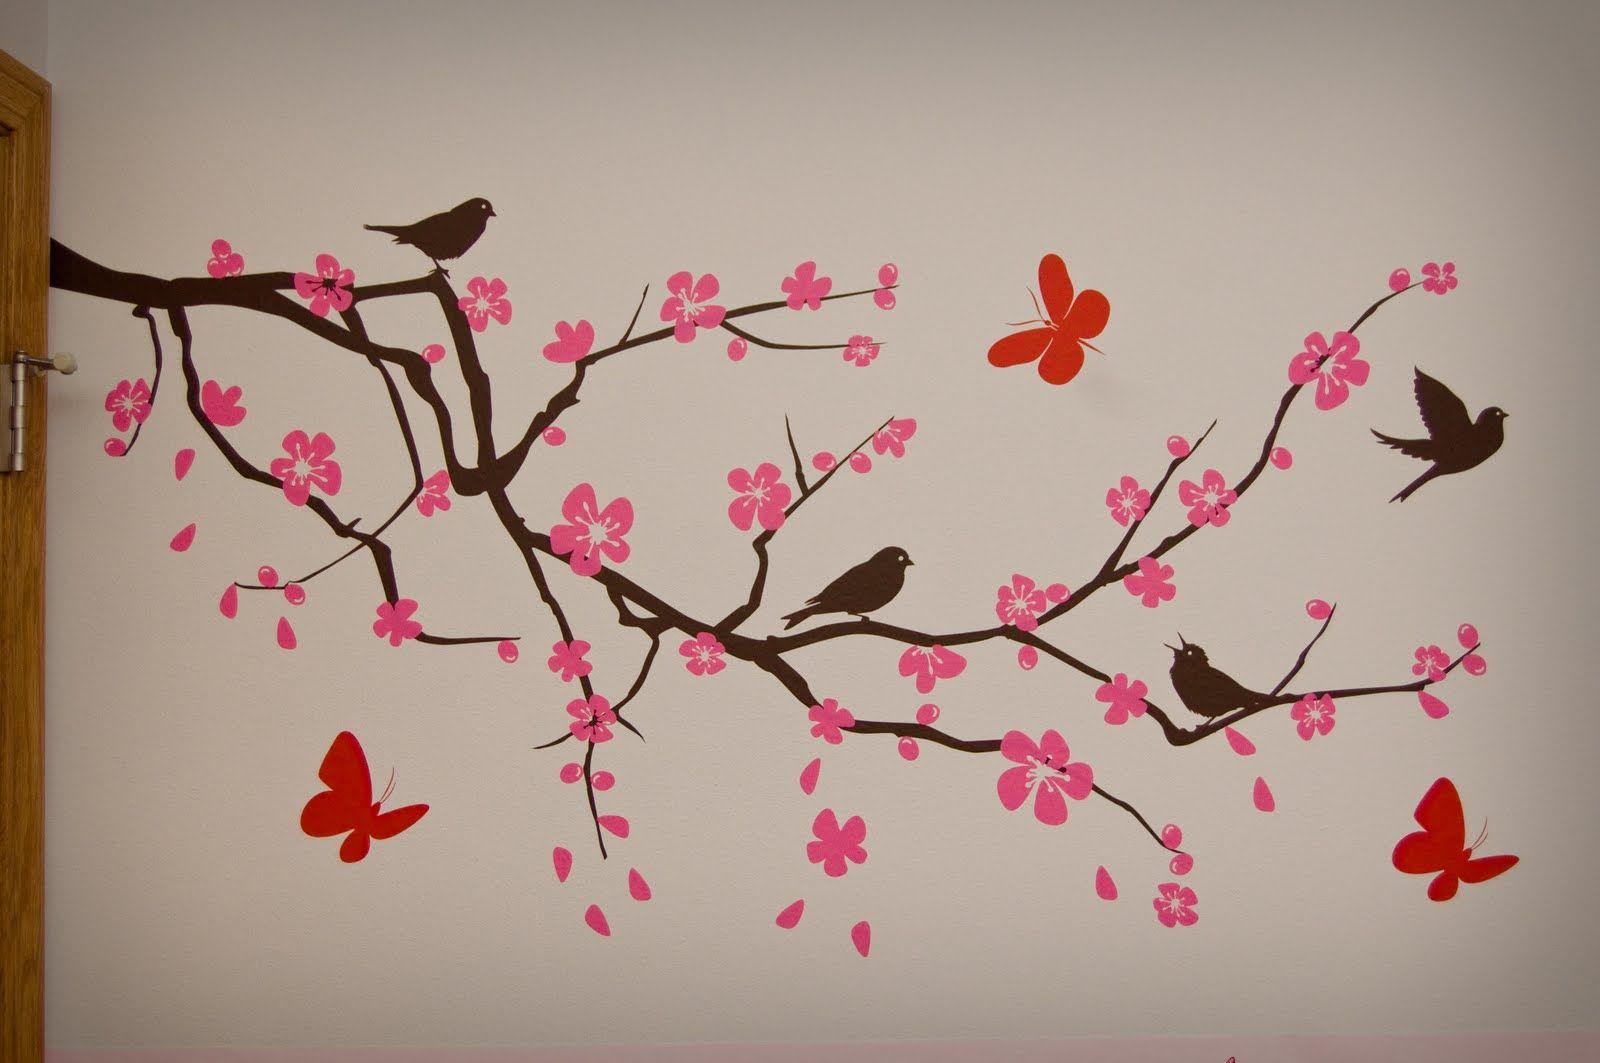 Google Image Result For Http 1 Bp Blogspot Com Ufqae Tgg O Tazpvj6u8pi Aaaaaaaal0c 0kdo52whp4c S1600 Back Tattoo Cherry Blossom Art Cherry Blossom Painting